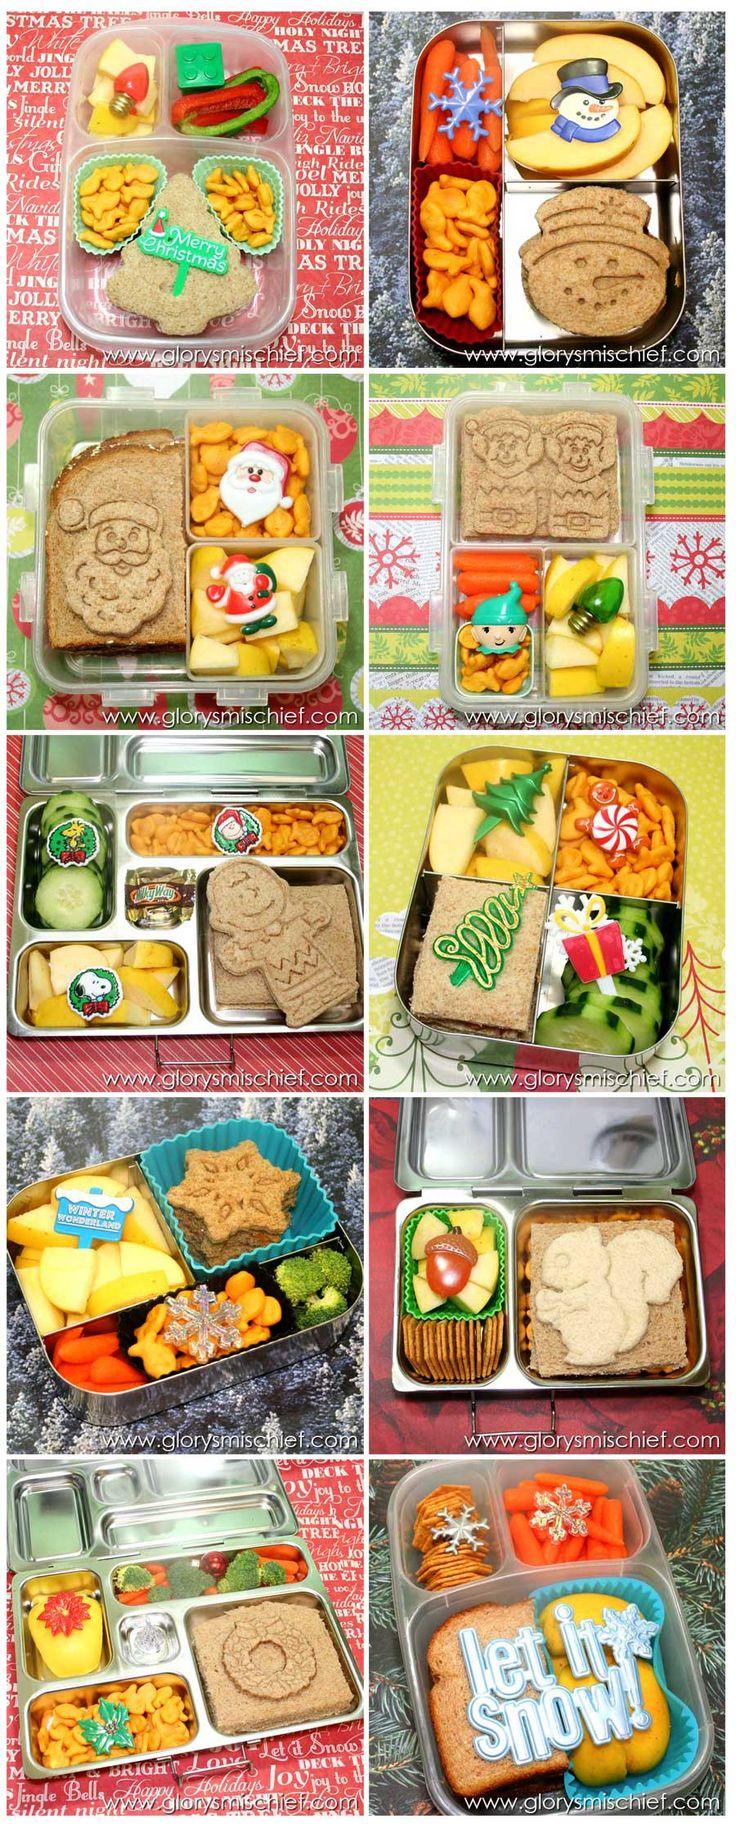 Kids Christmas Bento School Lunch - Healthy Ideas From GlorysMischief.com